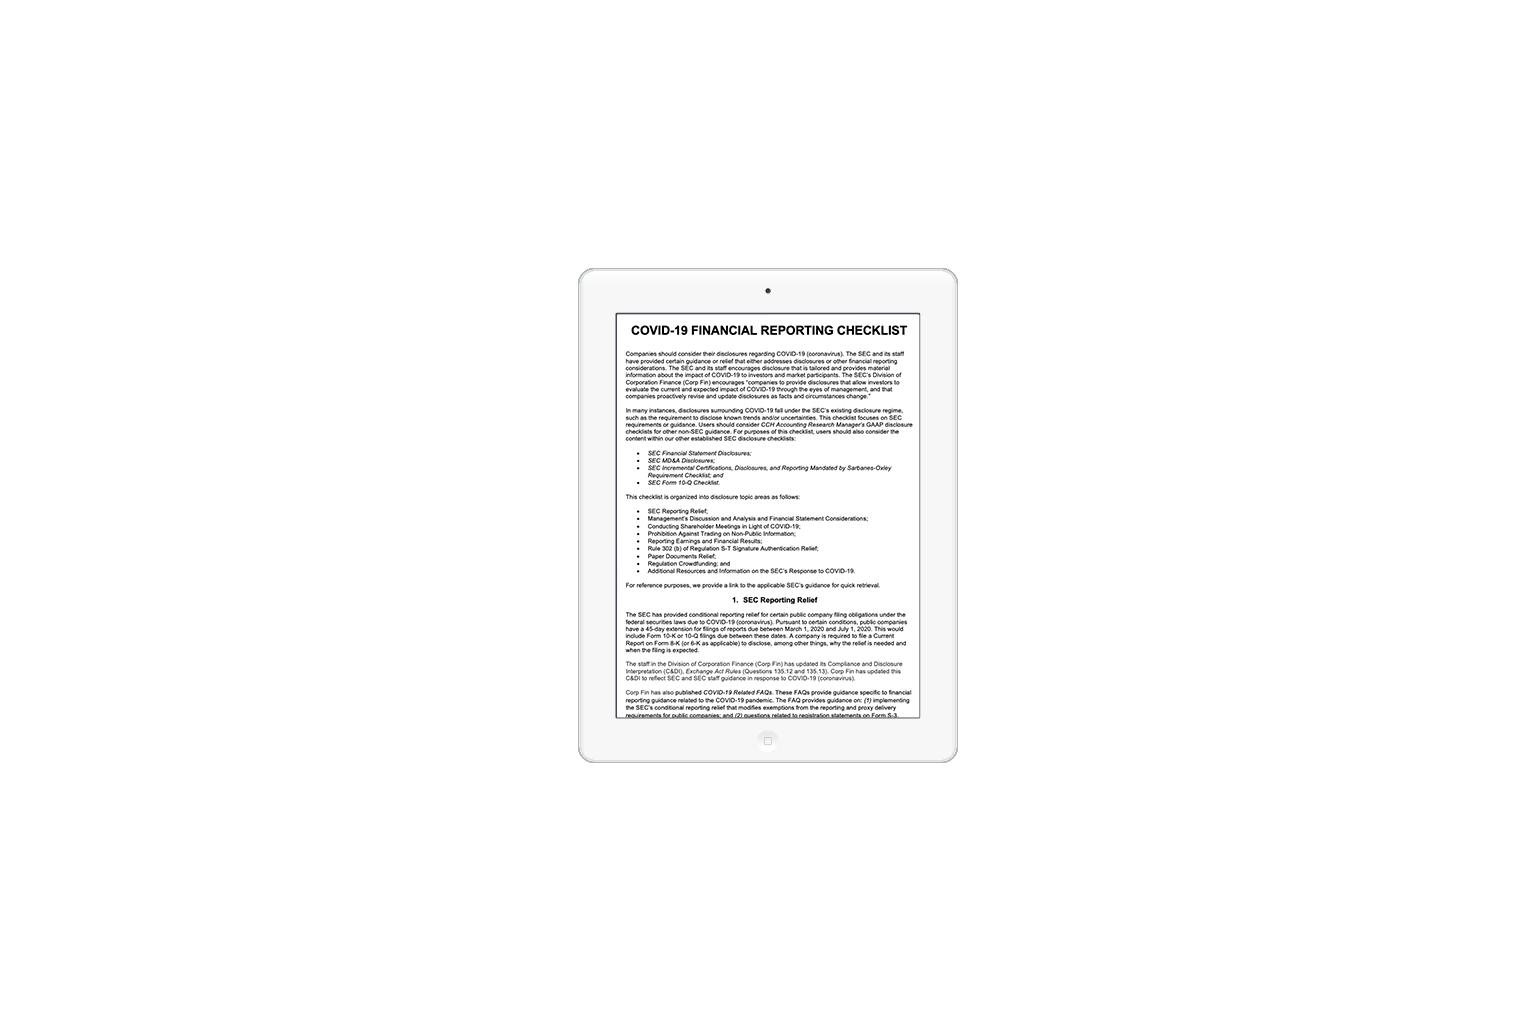 Financial Reporting Checklist